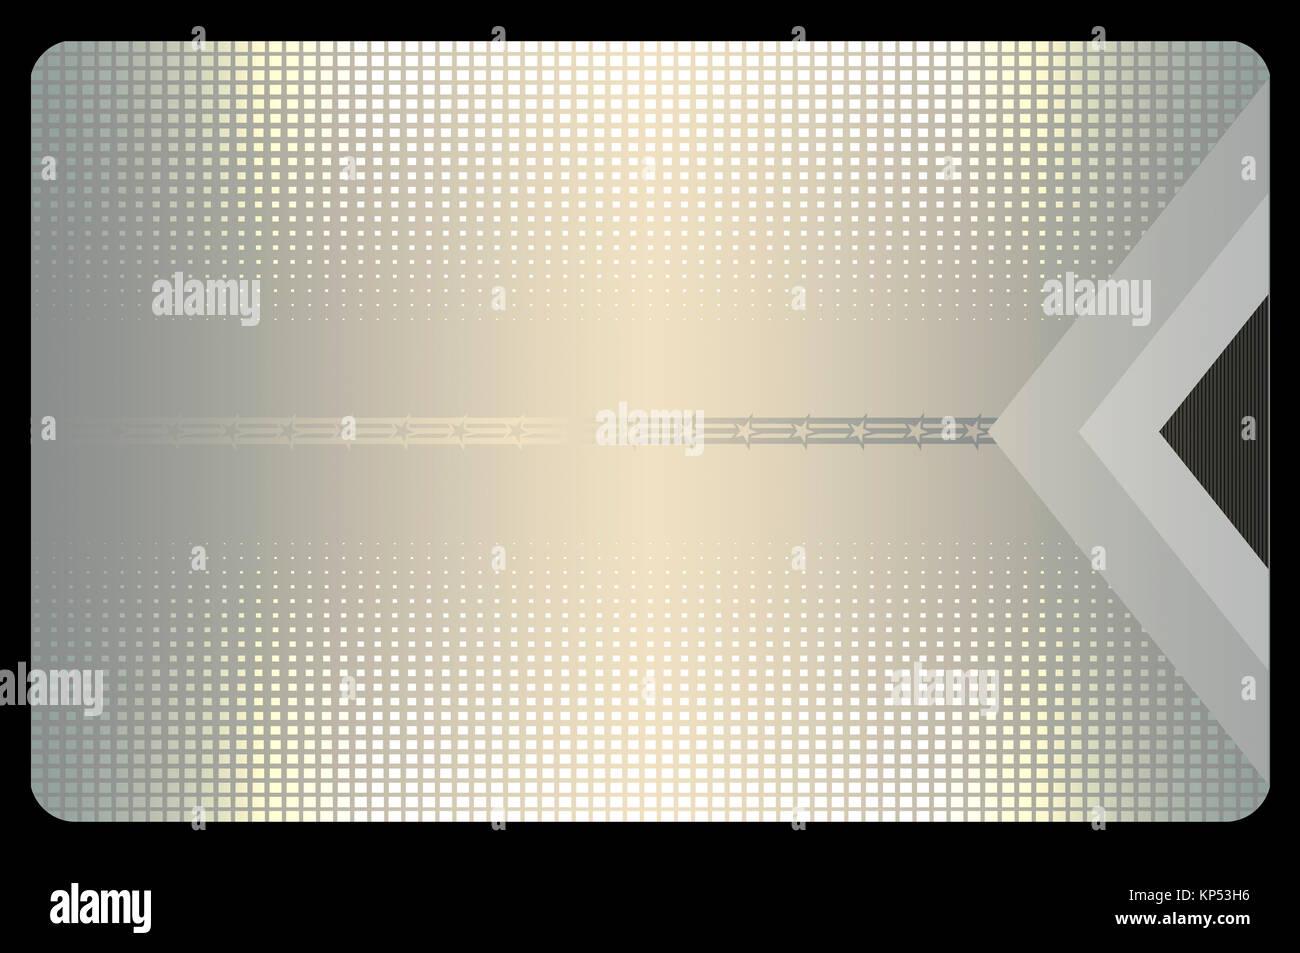 Futuristic background with halftone patterns and stars for the futuristic background with halftone patterns and stars for the design of business card colourmoves